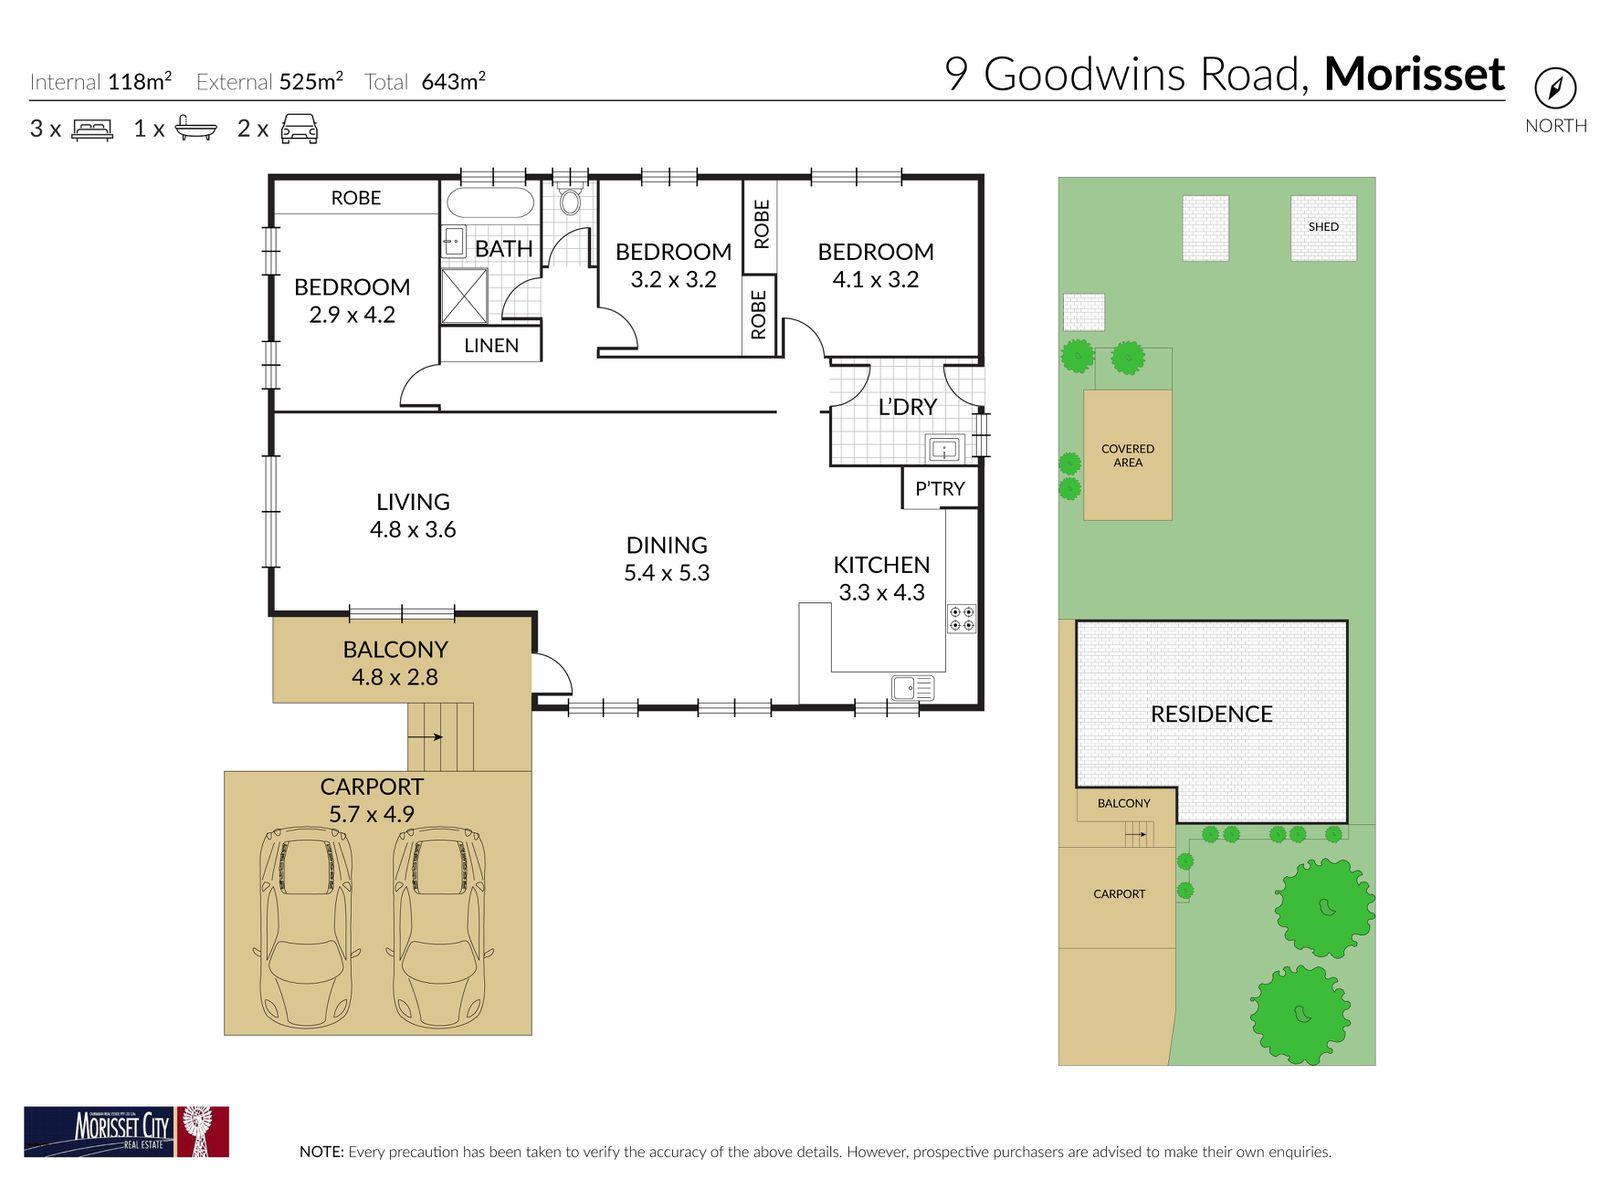 9 Goodwins Road, Morisset